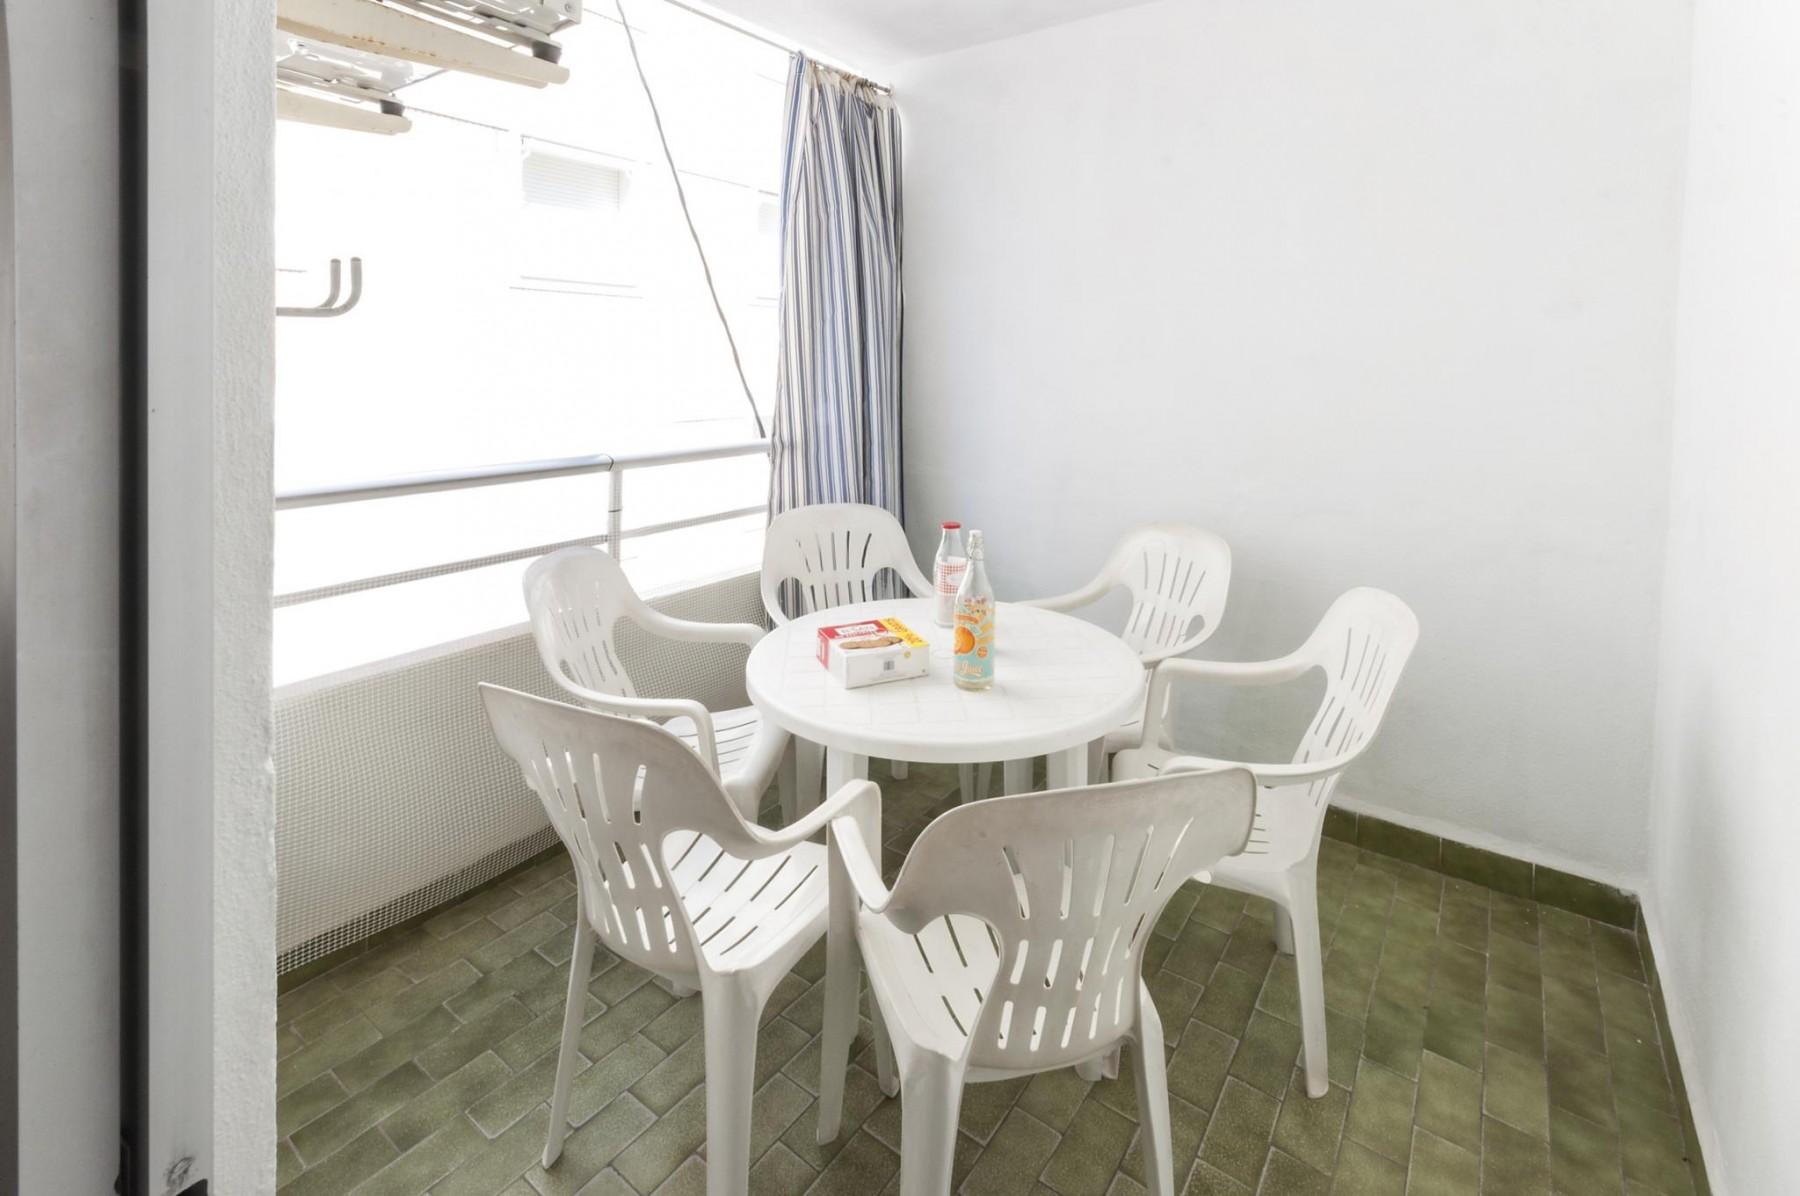 RONCESVALLES for 7 guests in Gandia, Spain